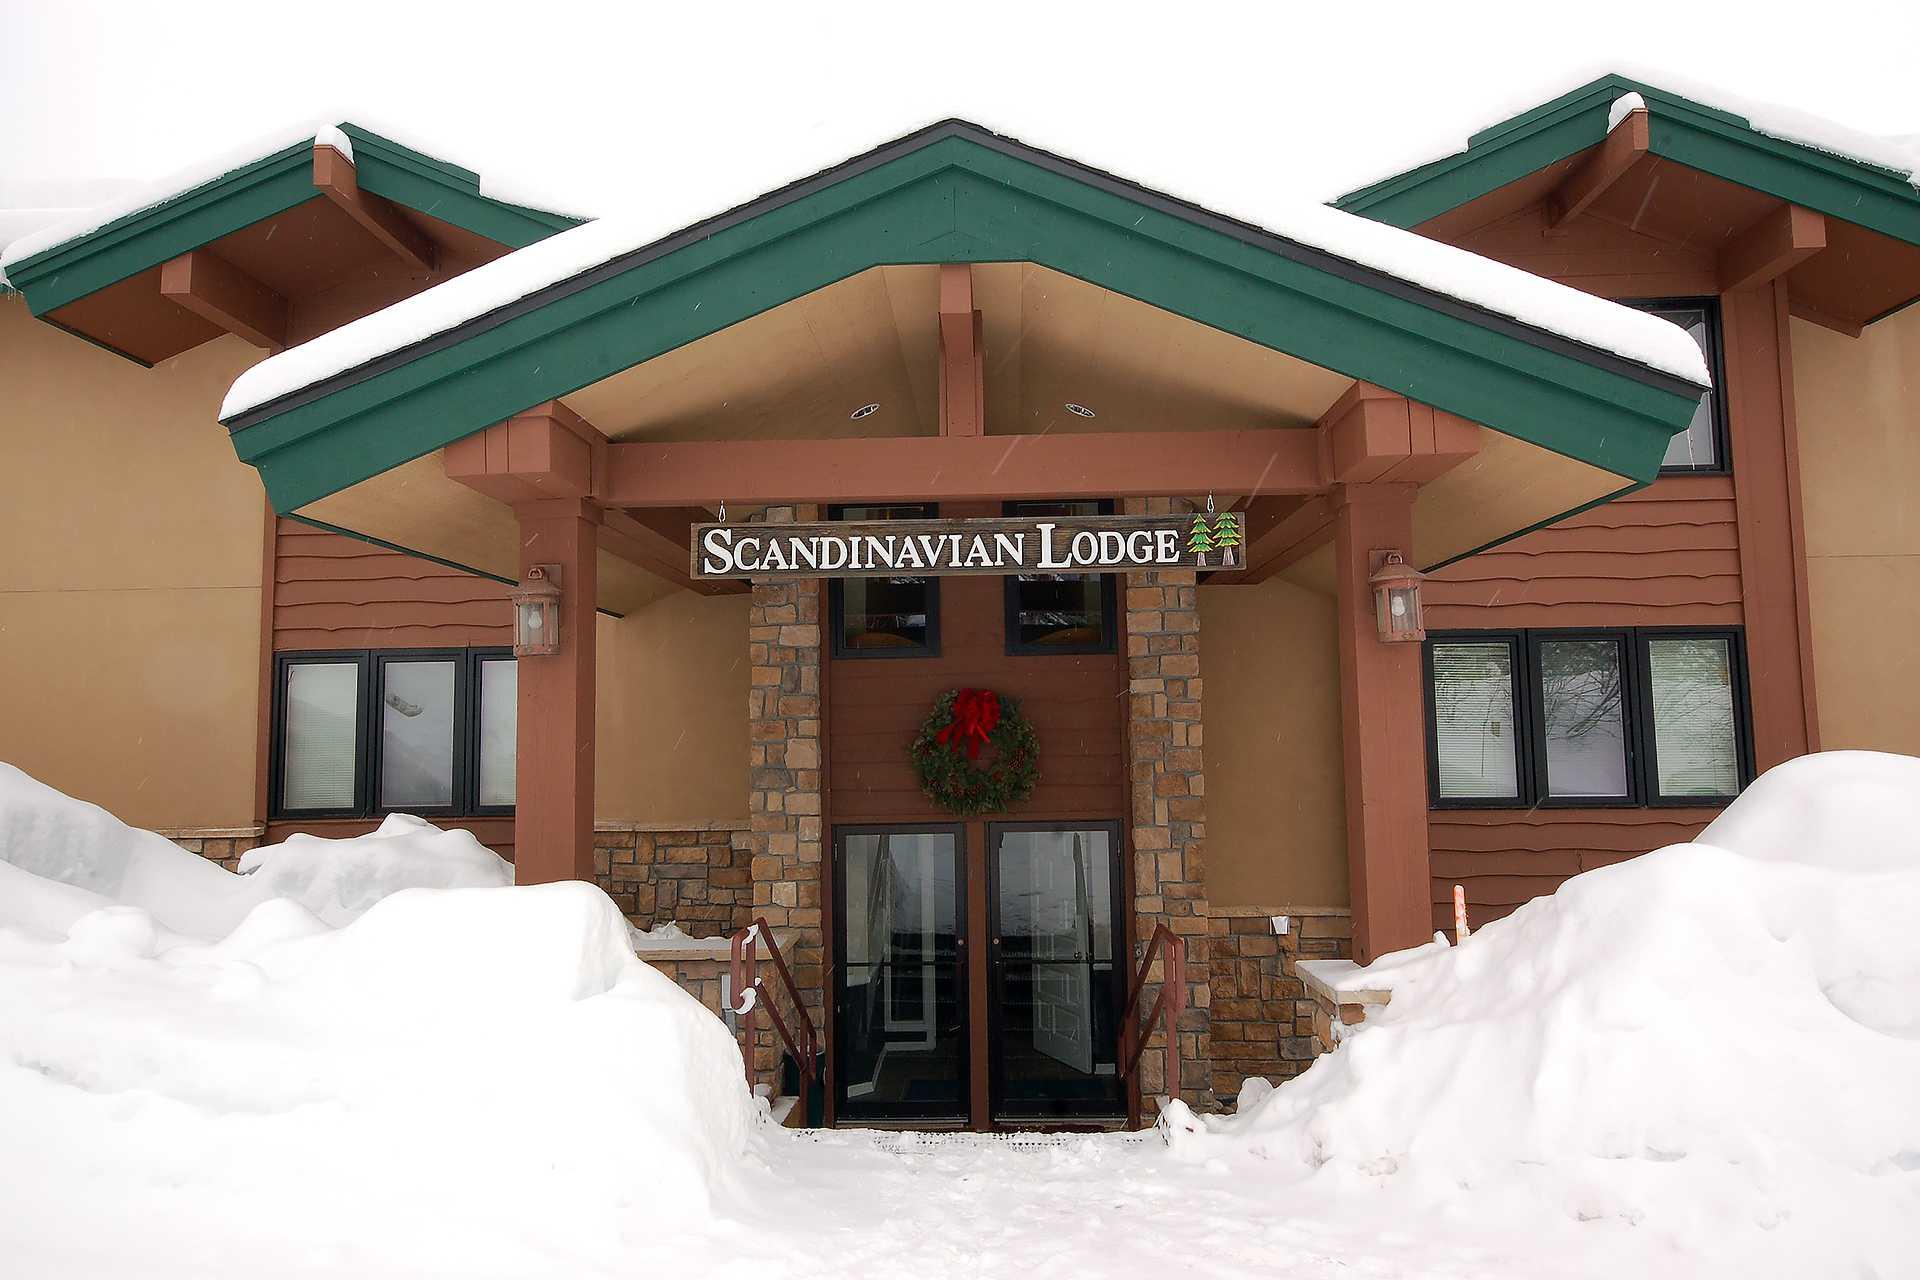 SL106 - Scandinavian Lodge and Condominiums